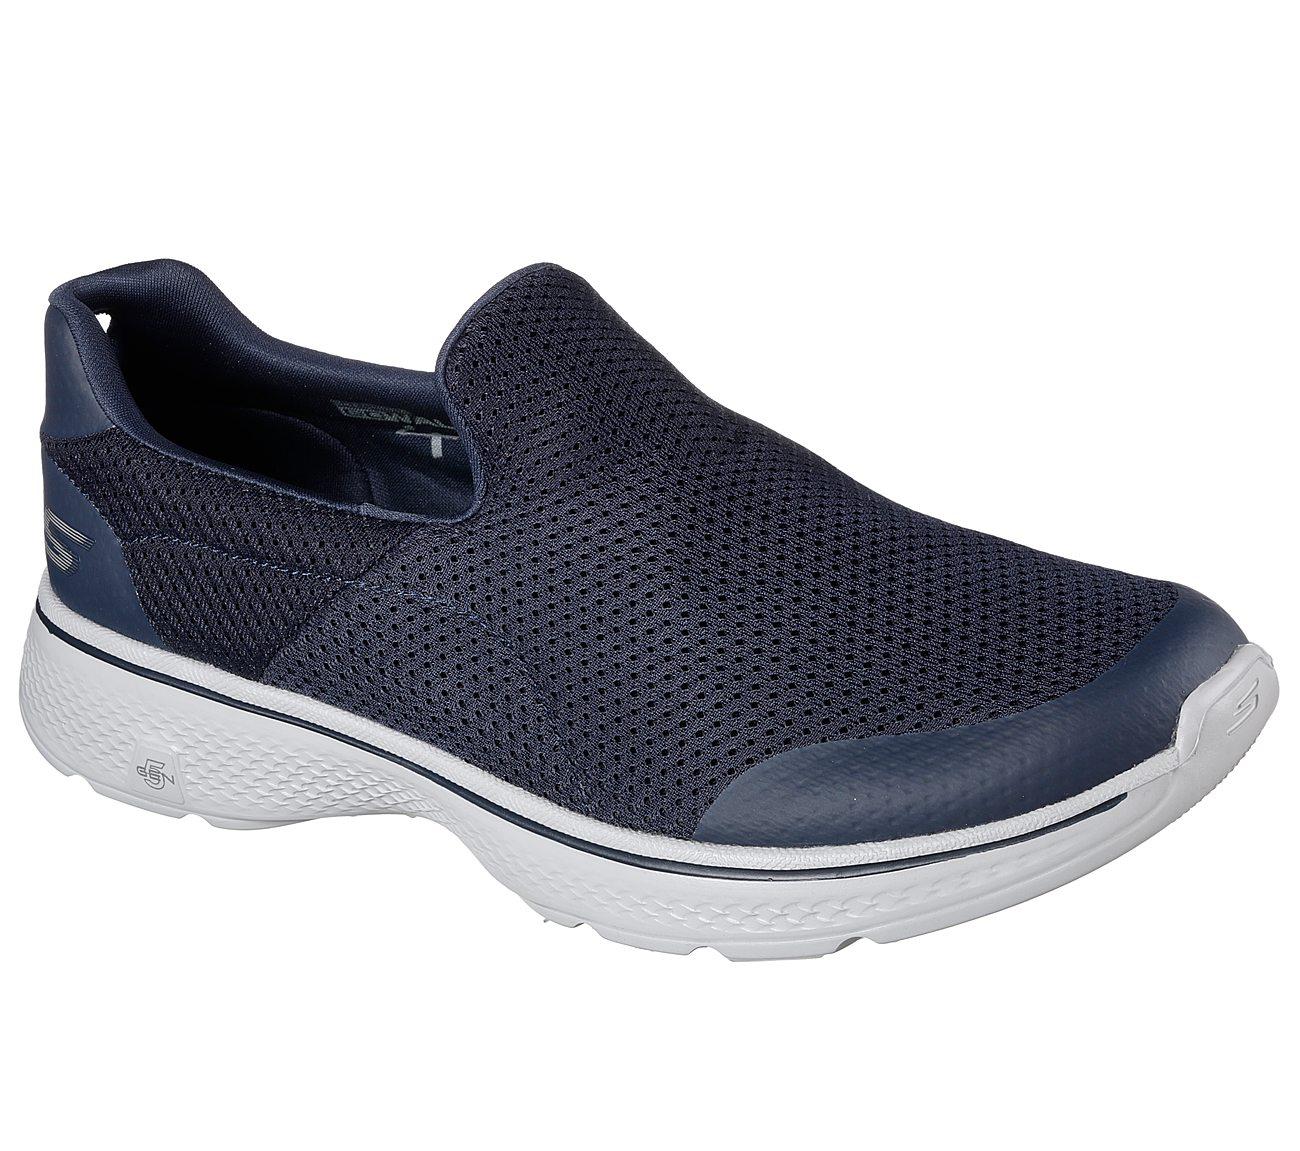 Skechers GOwalk 4 - Incredible